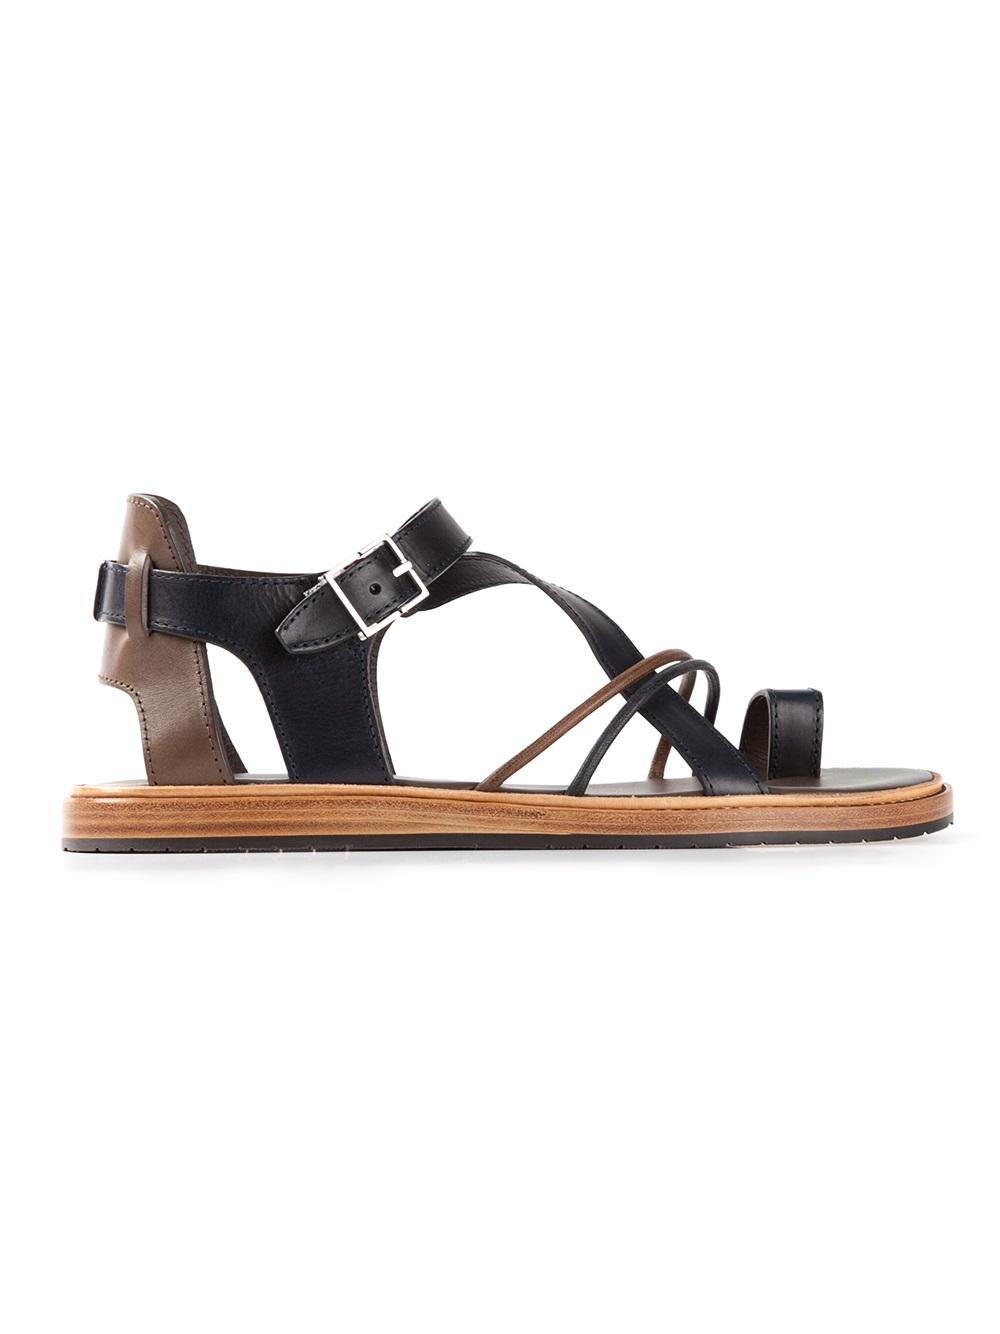 b425bcd517f Lyst - Dior Homme Strap Sandals in Black for Men